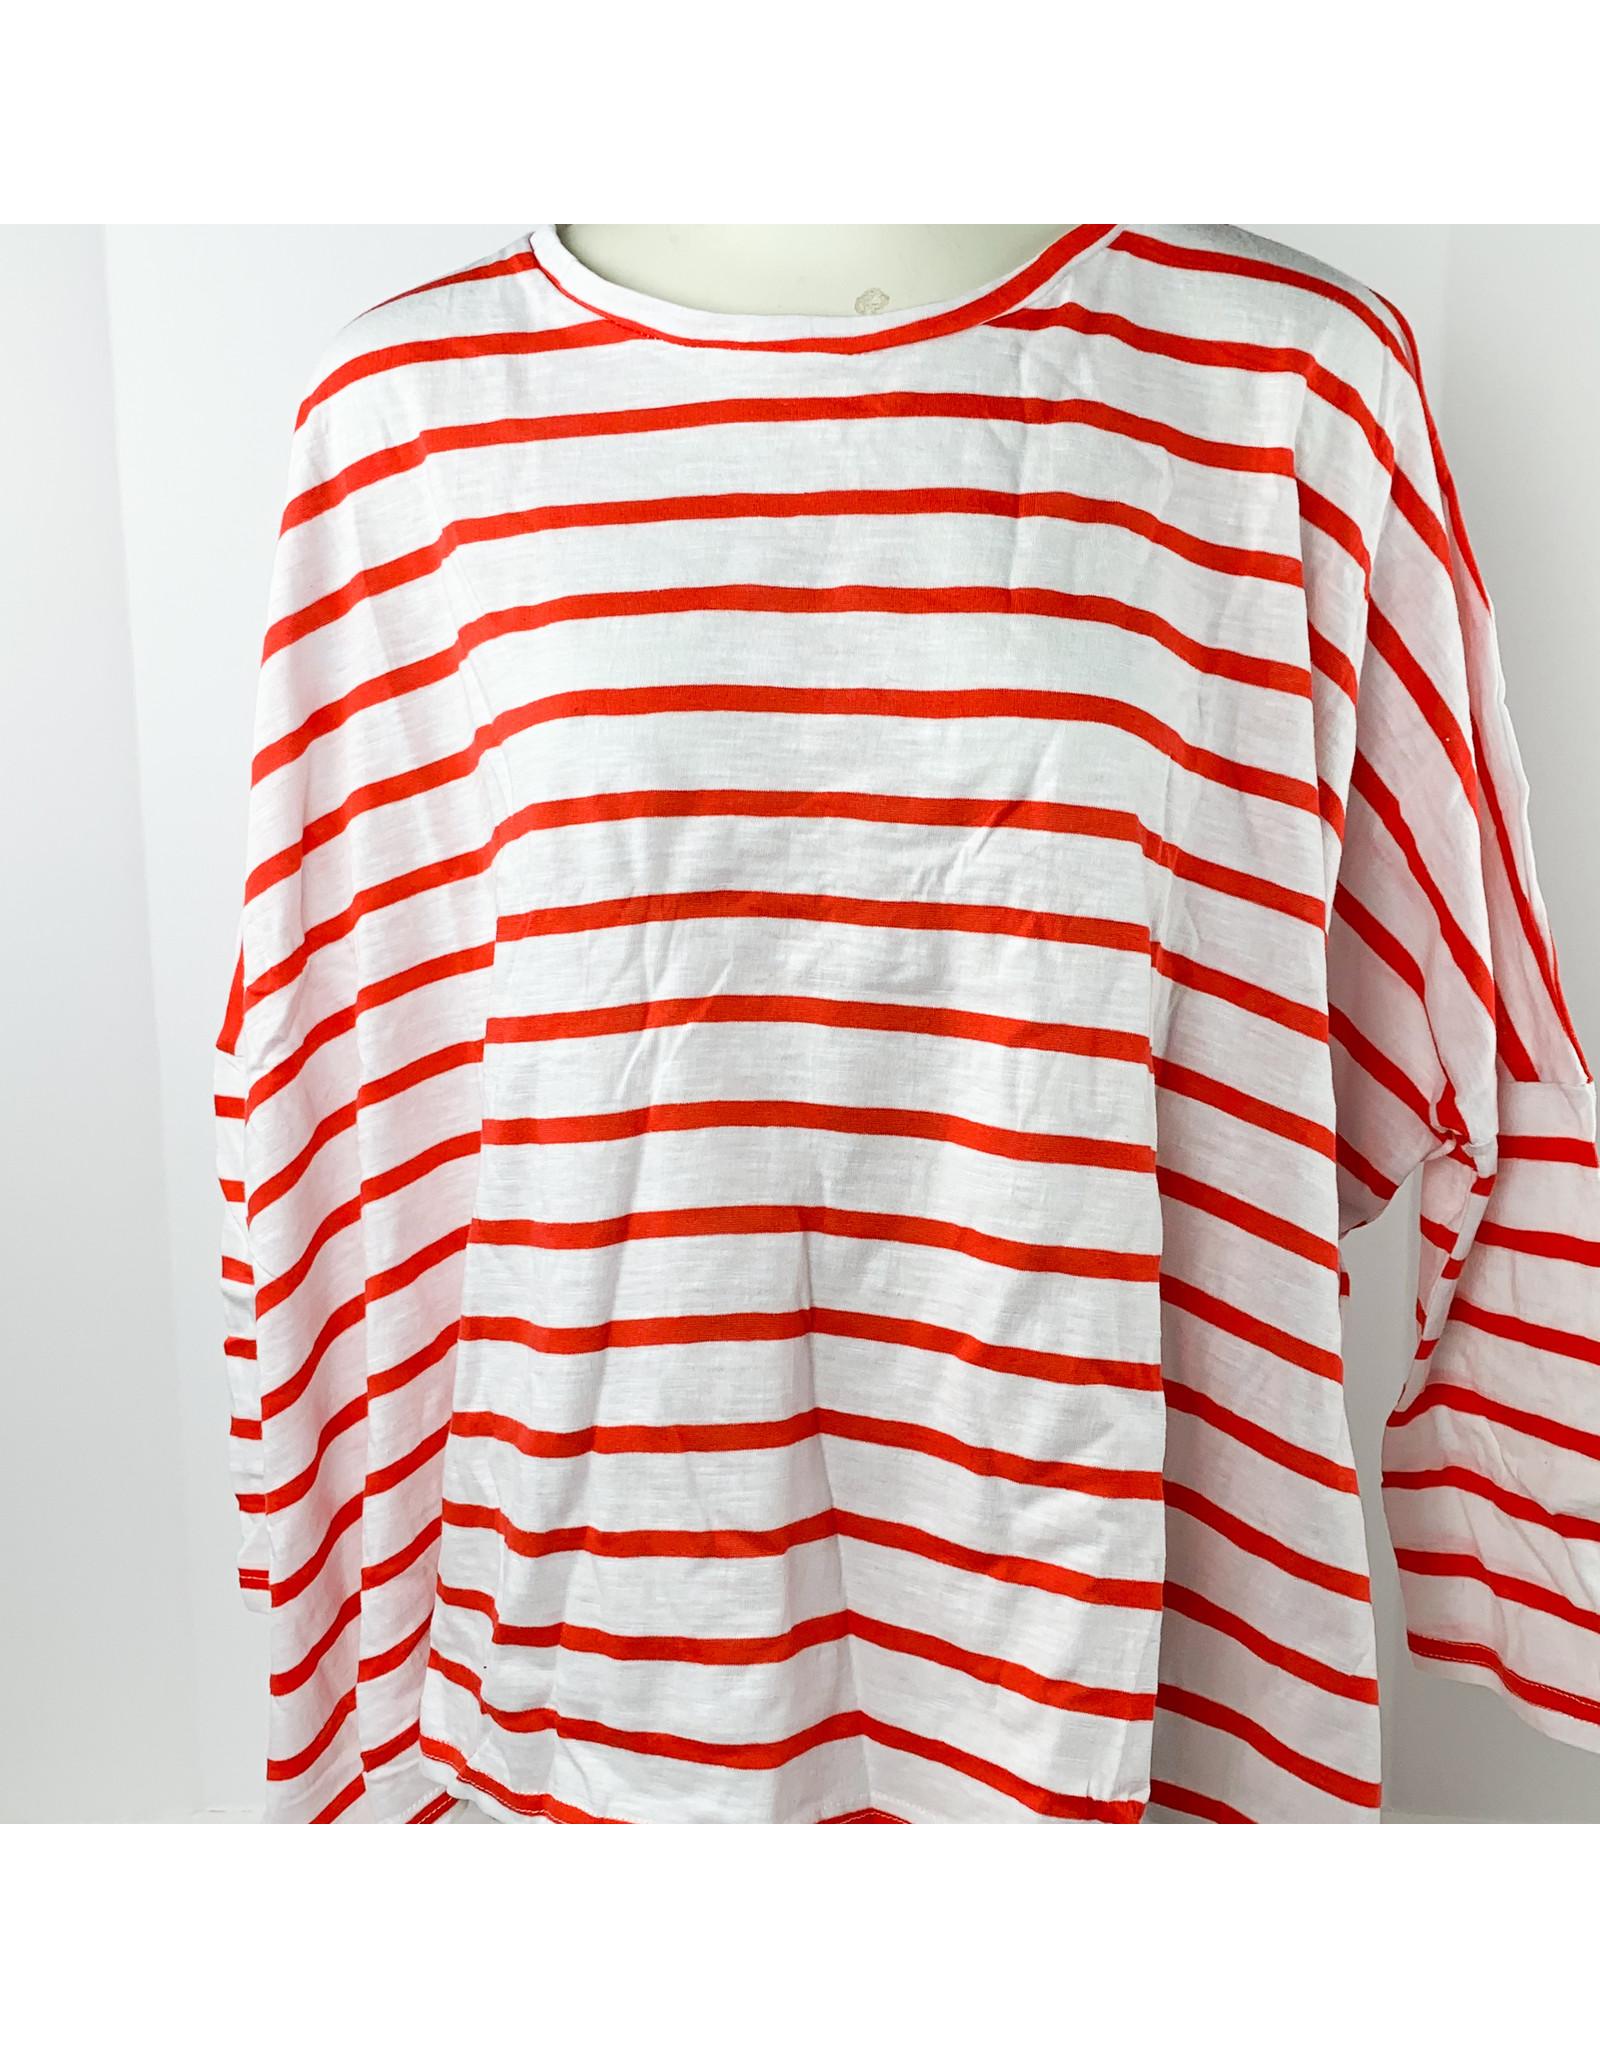 Mer Sea Catalina Linen Slub-White/Red